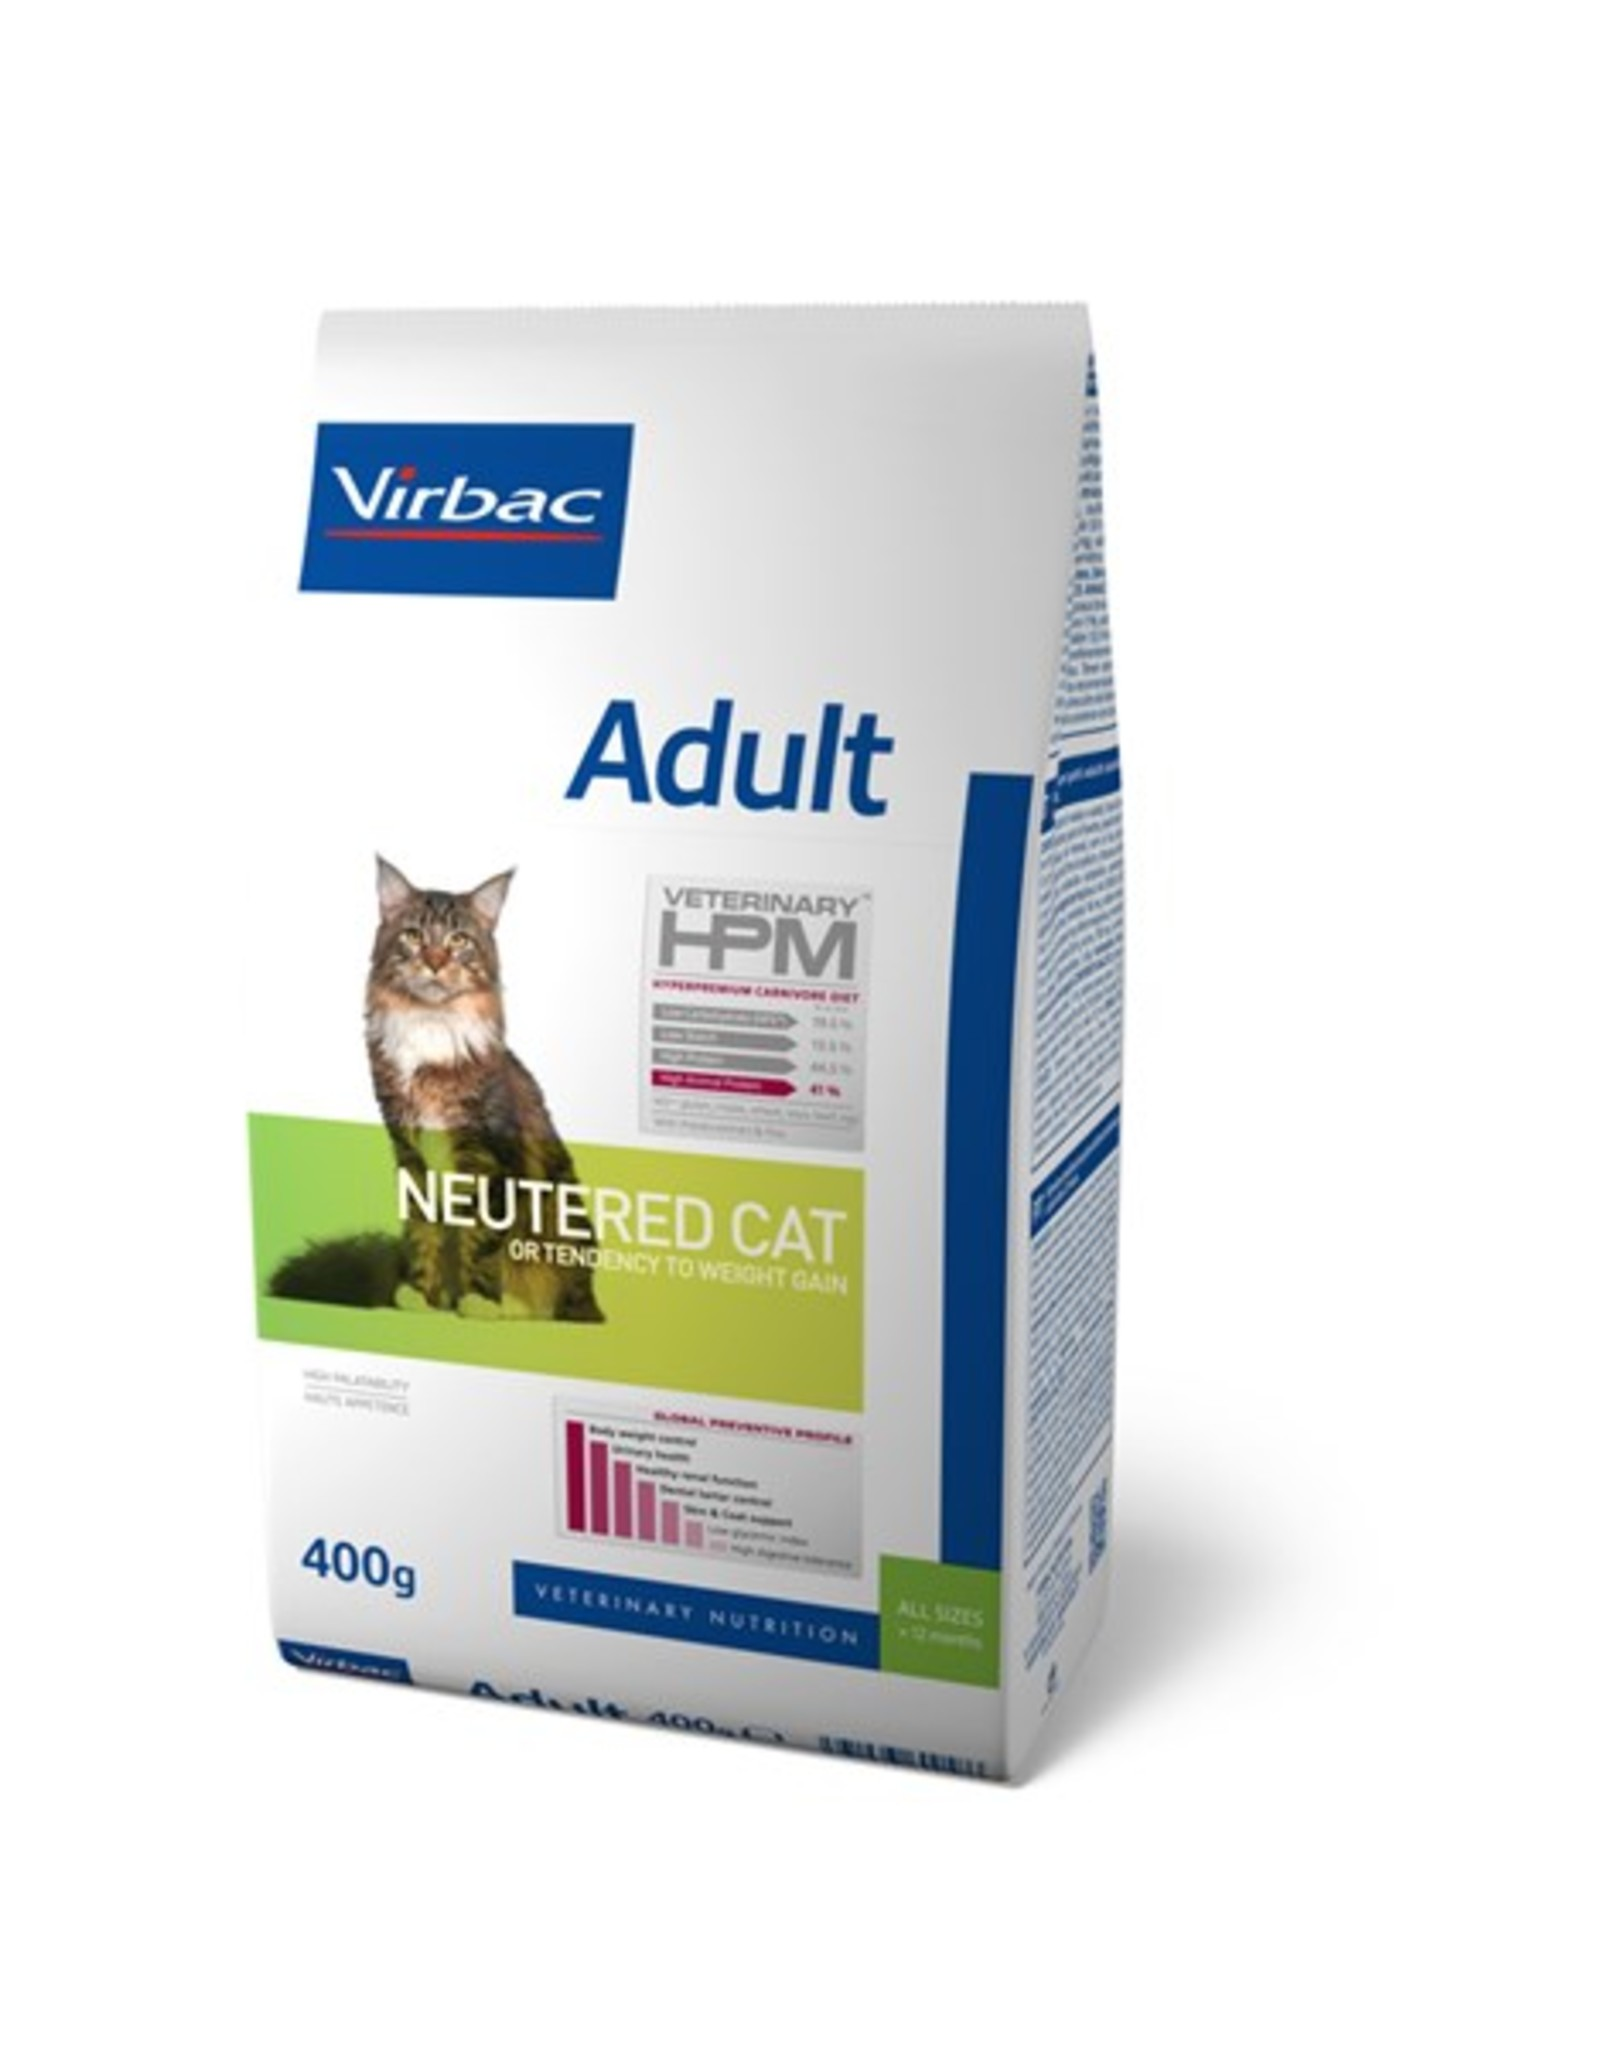 Virbac Virbac Hpm Katze Neutered Adult 0,4kg